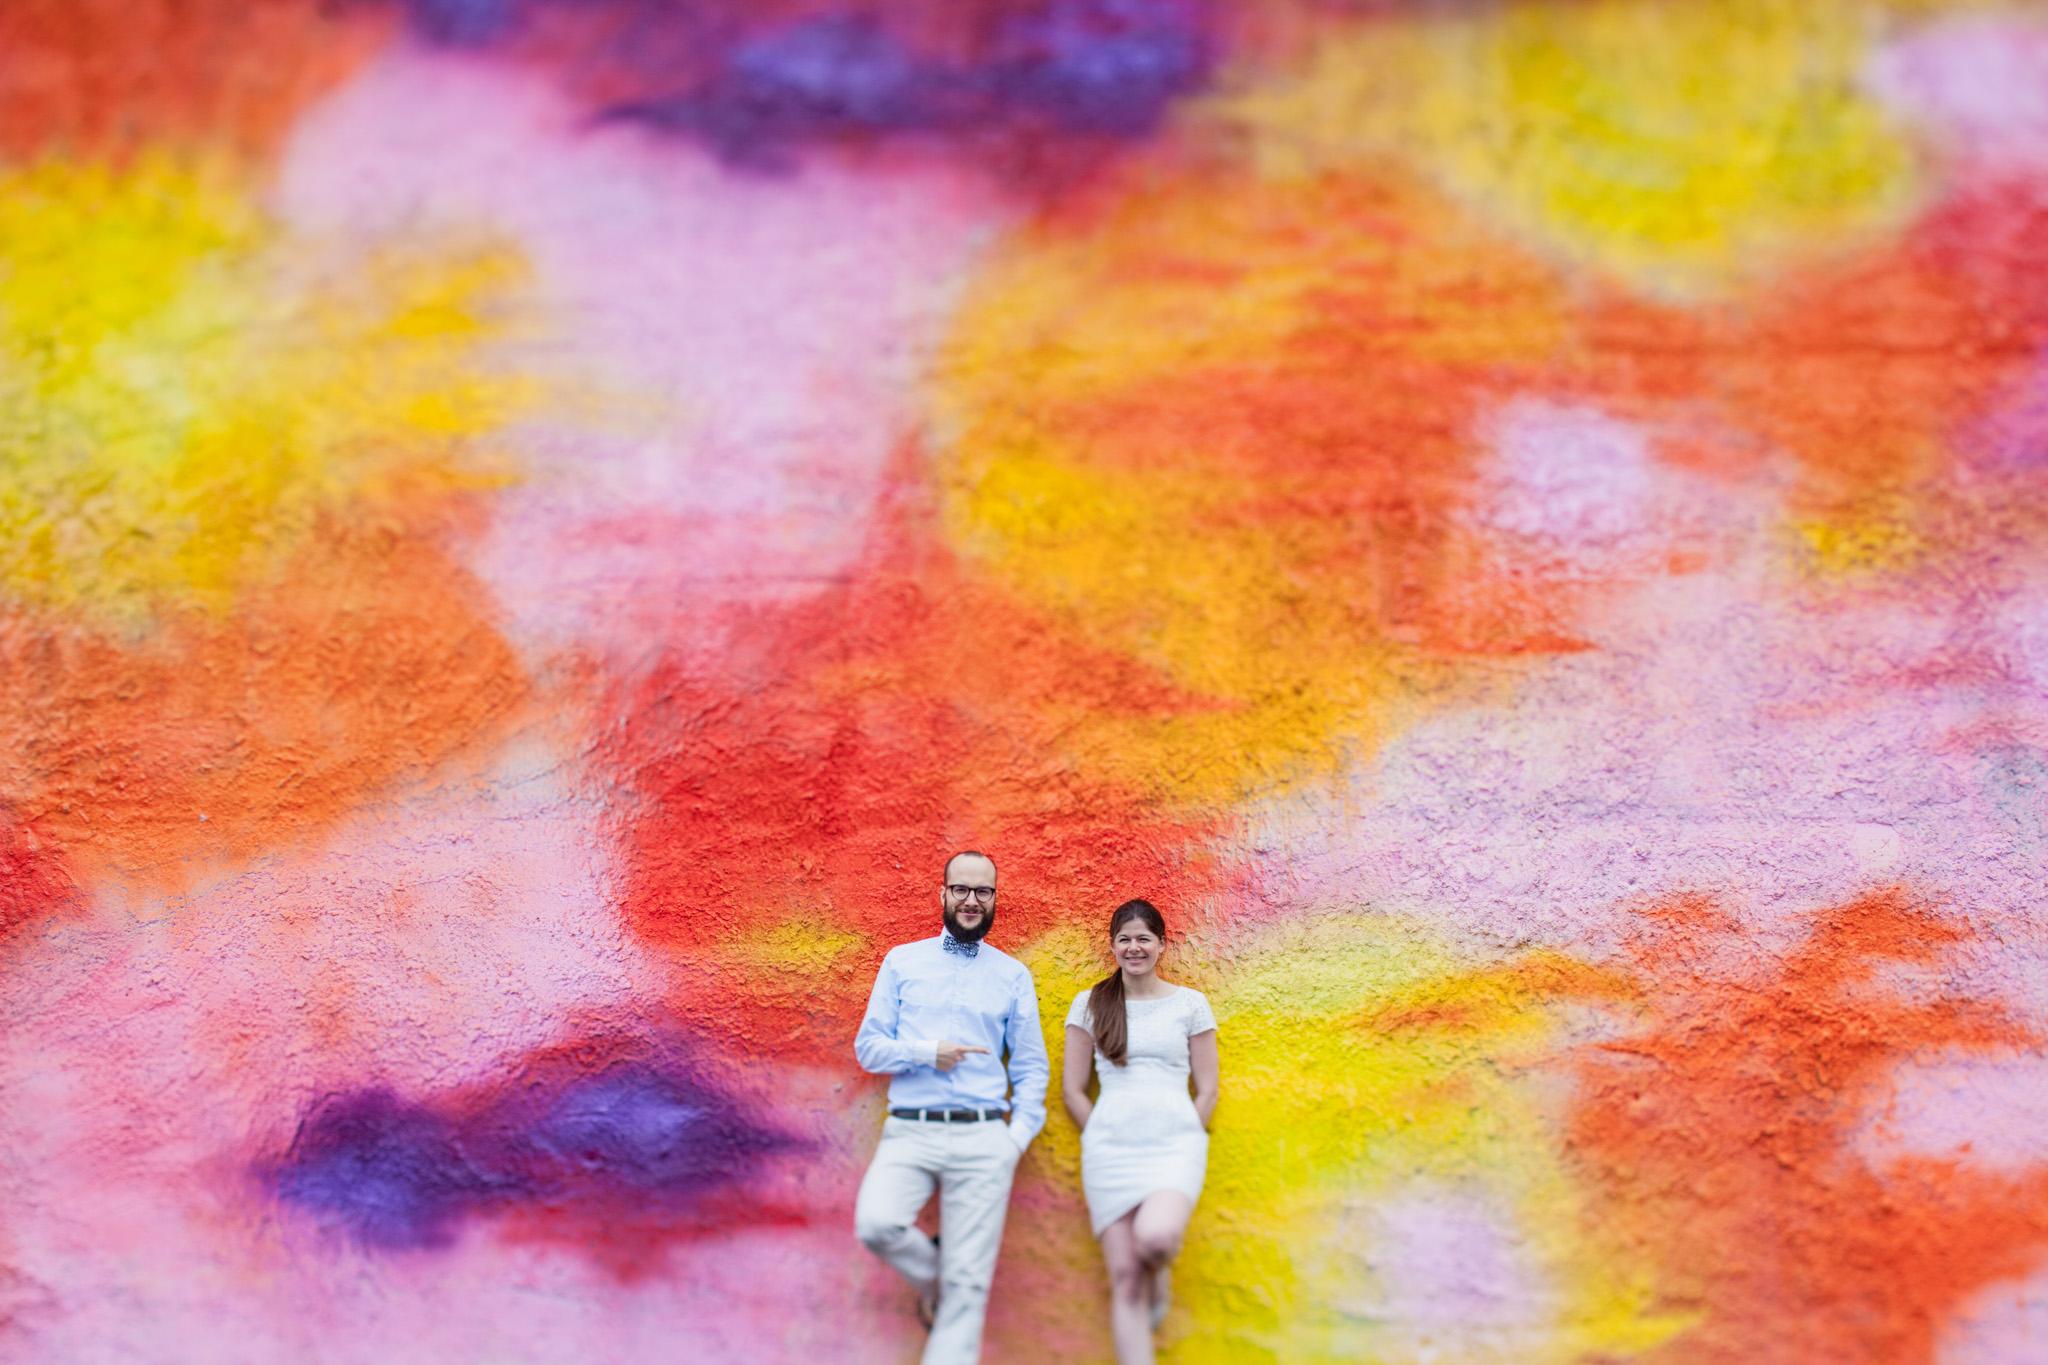 hochzeit-neuseeland-new-zealand-roadtrip-weddingphotography-karol-and-jens_102.jpg